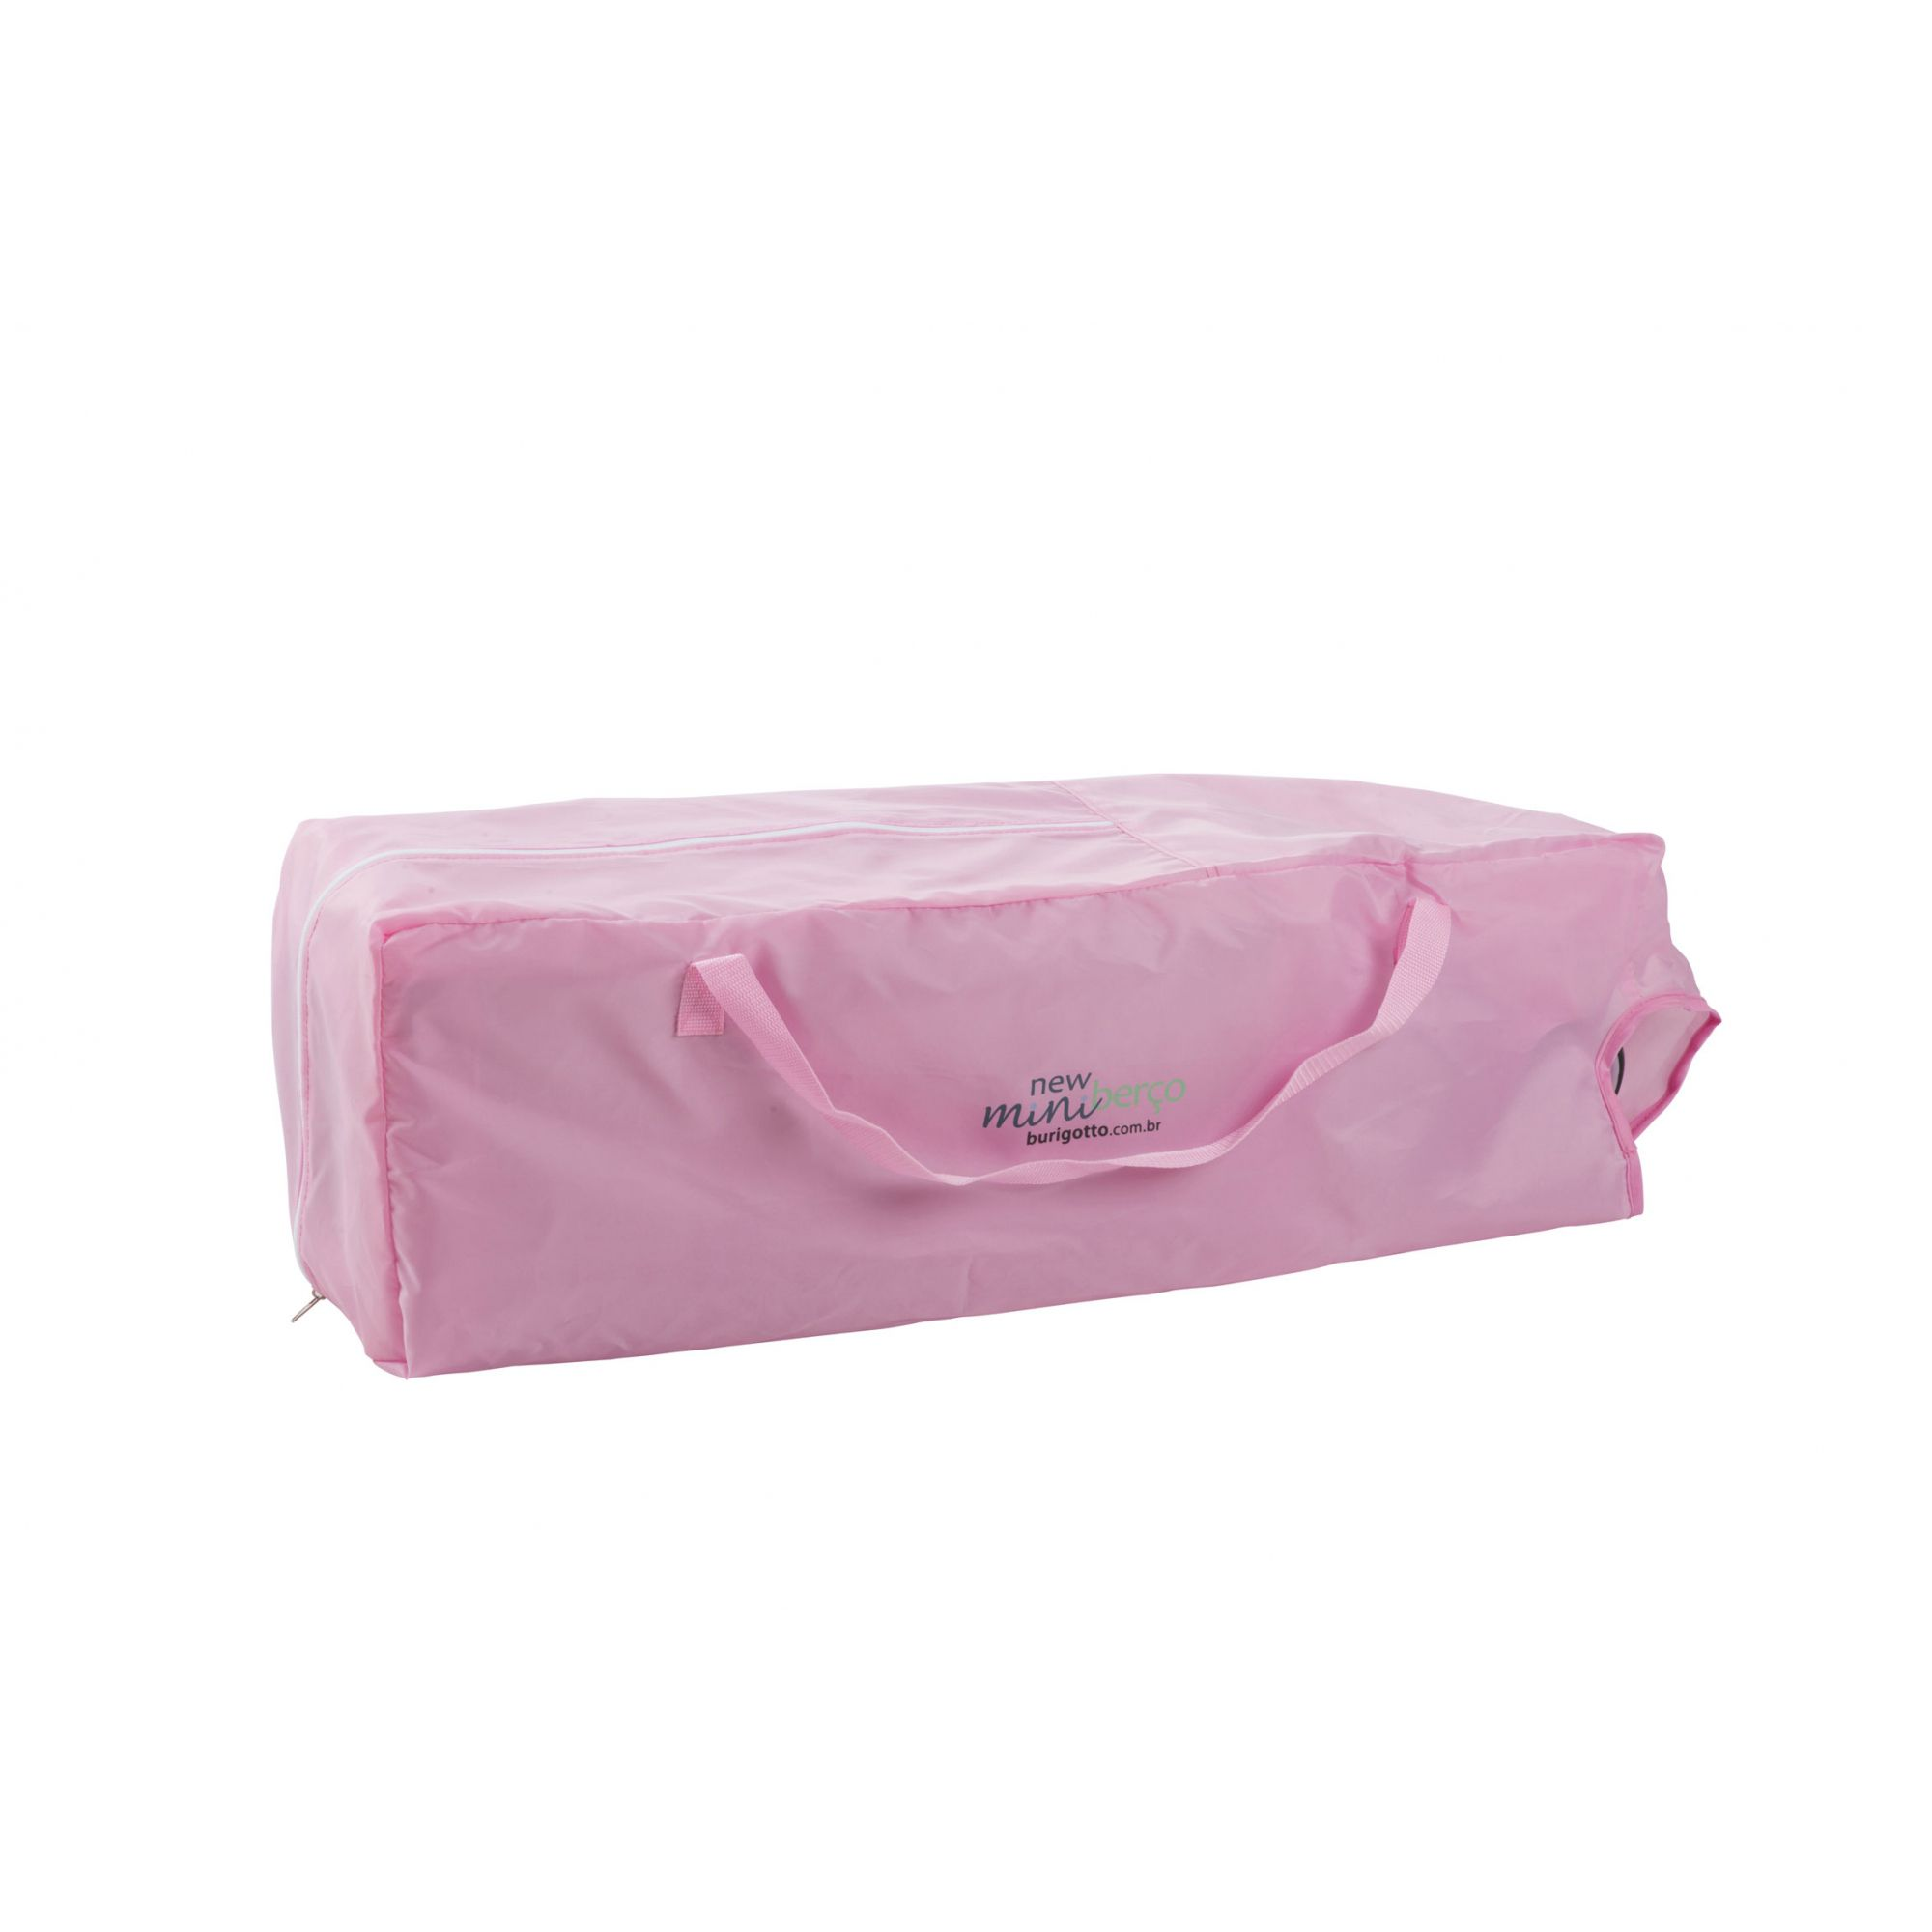 New Mini Berço Pink - Burigotto Ref Ixbe5103pkc7 Pink